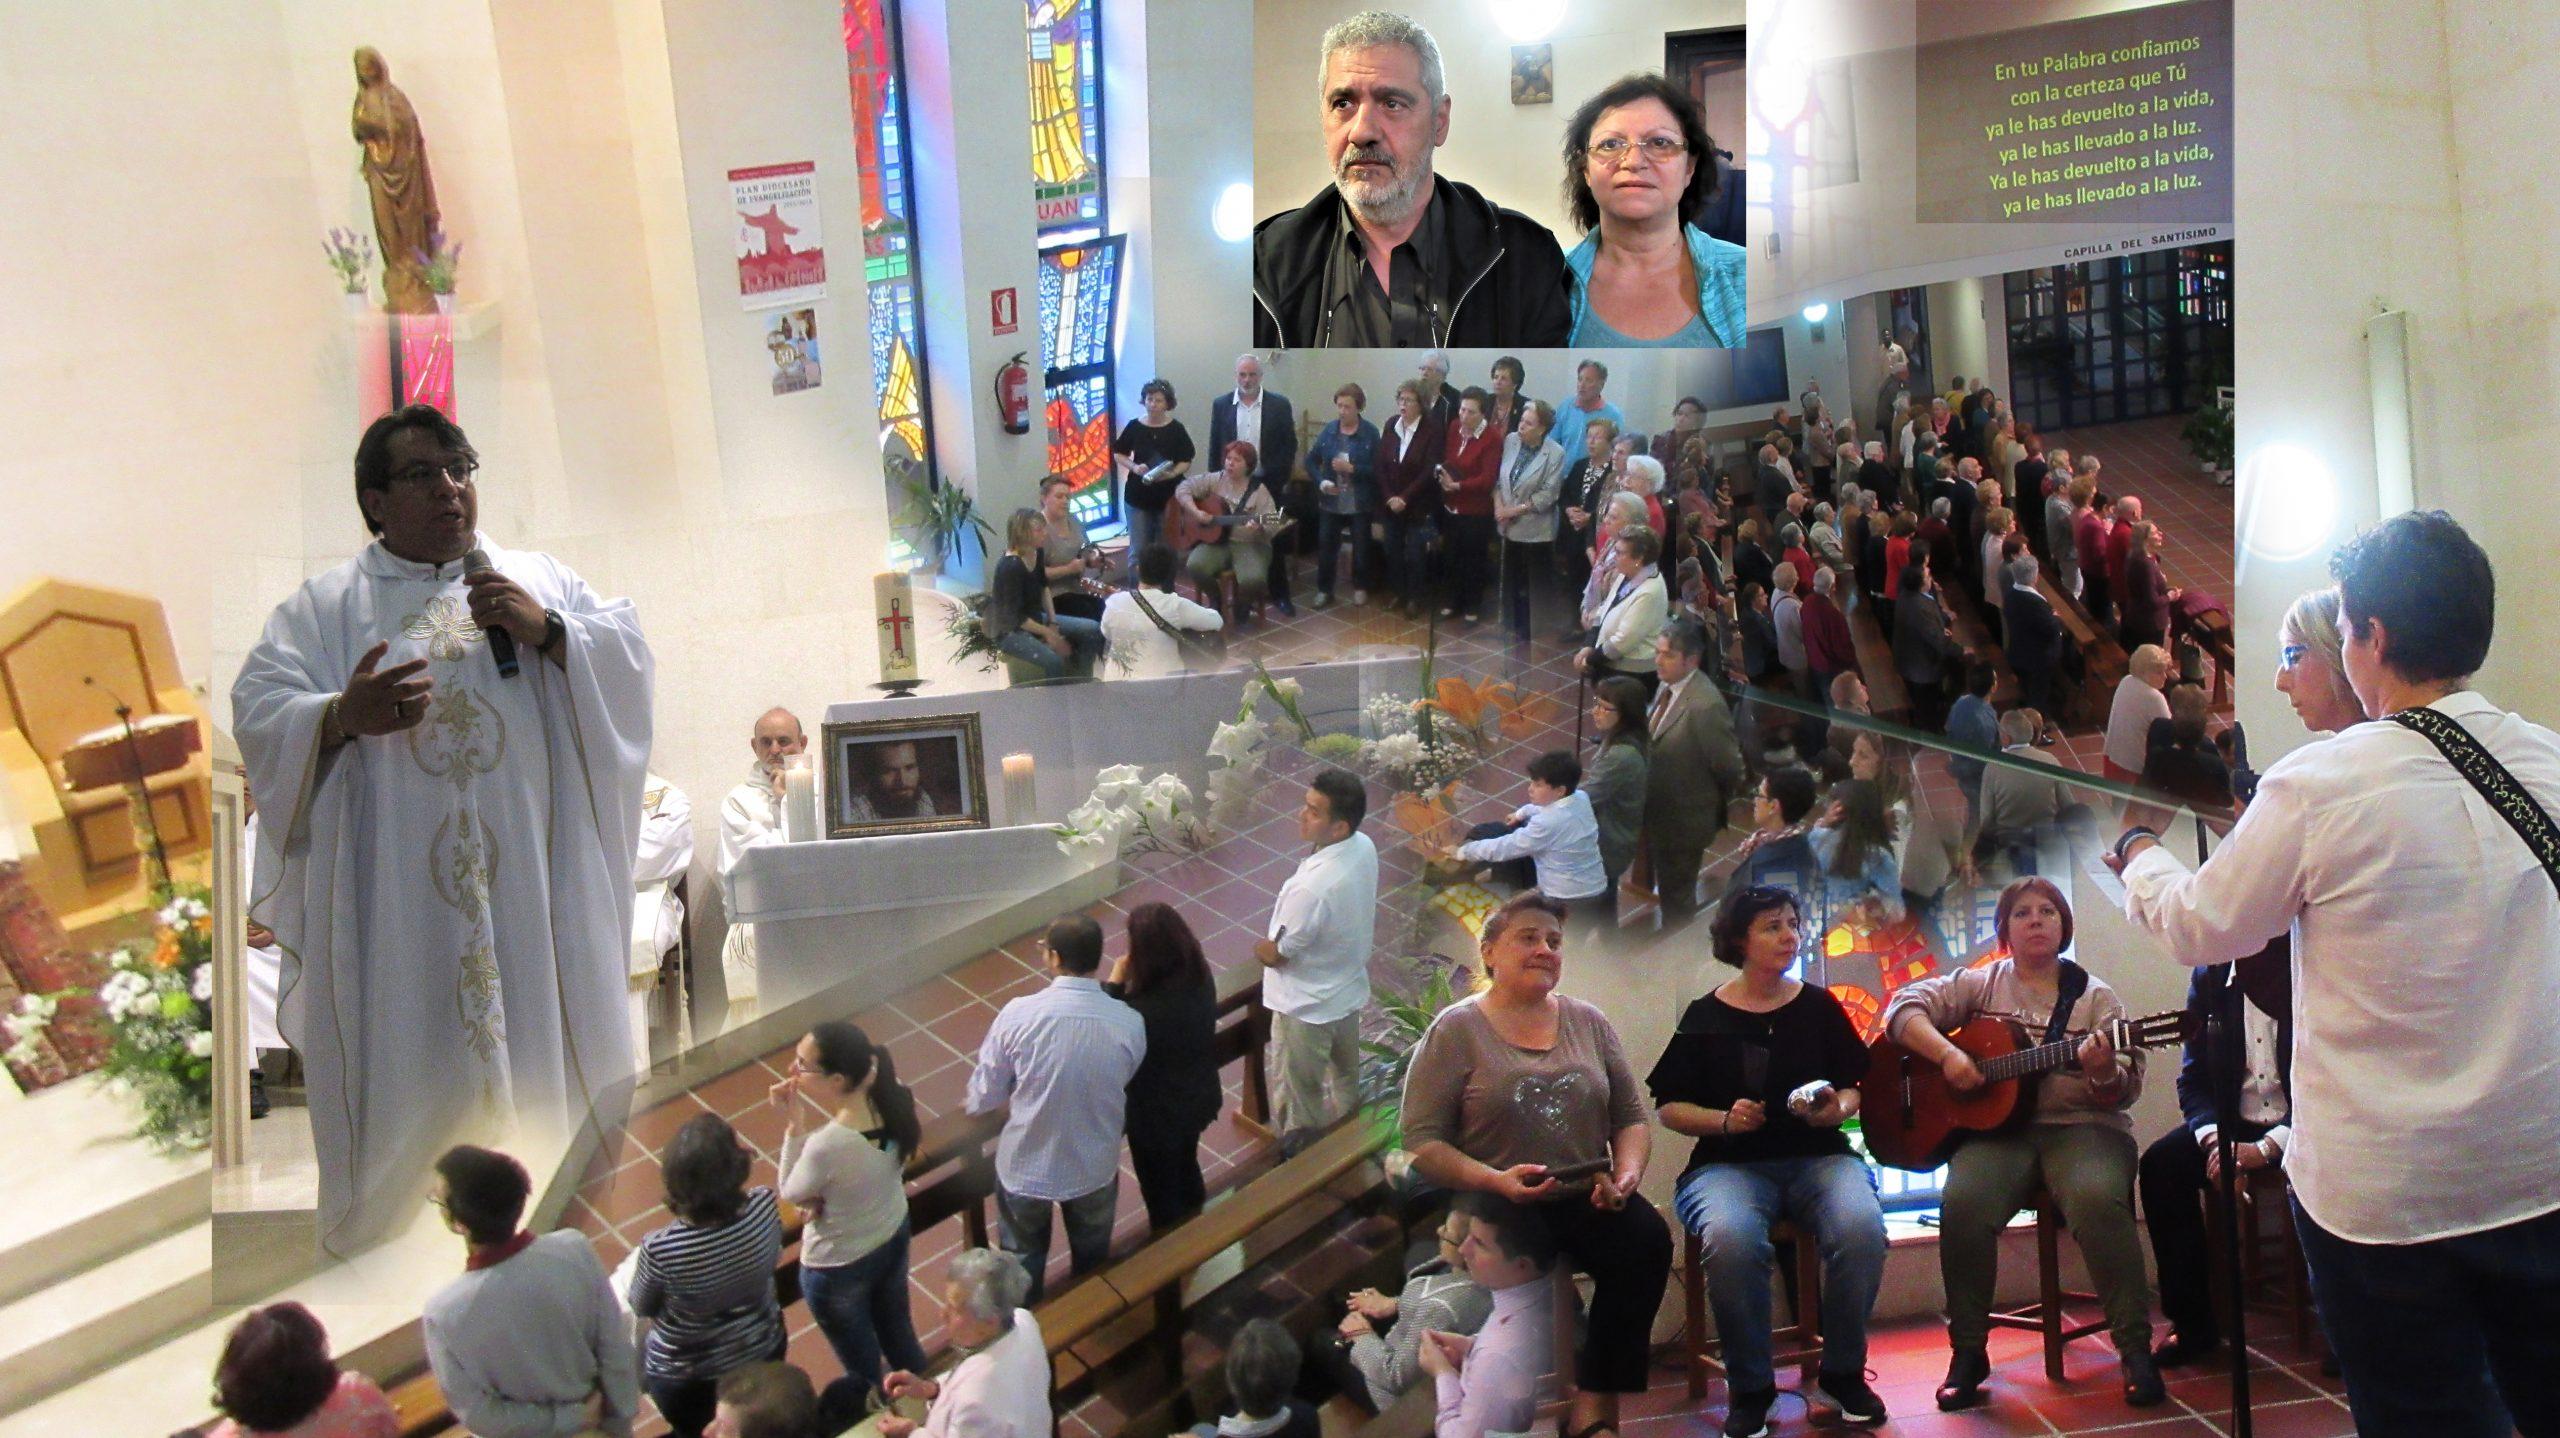 Con México (Chava) en Altagracia Madrid, funeral